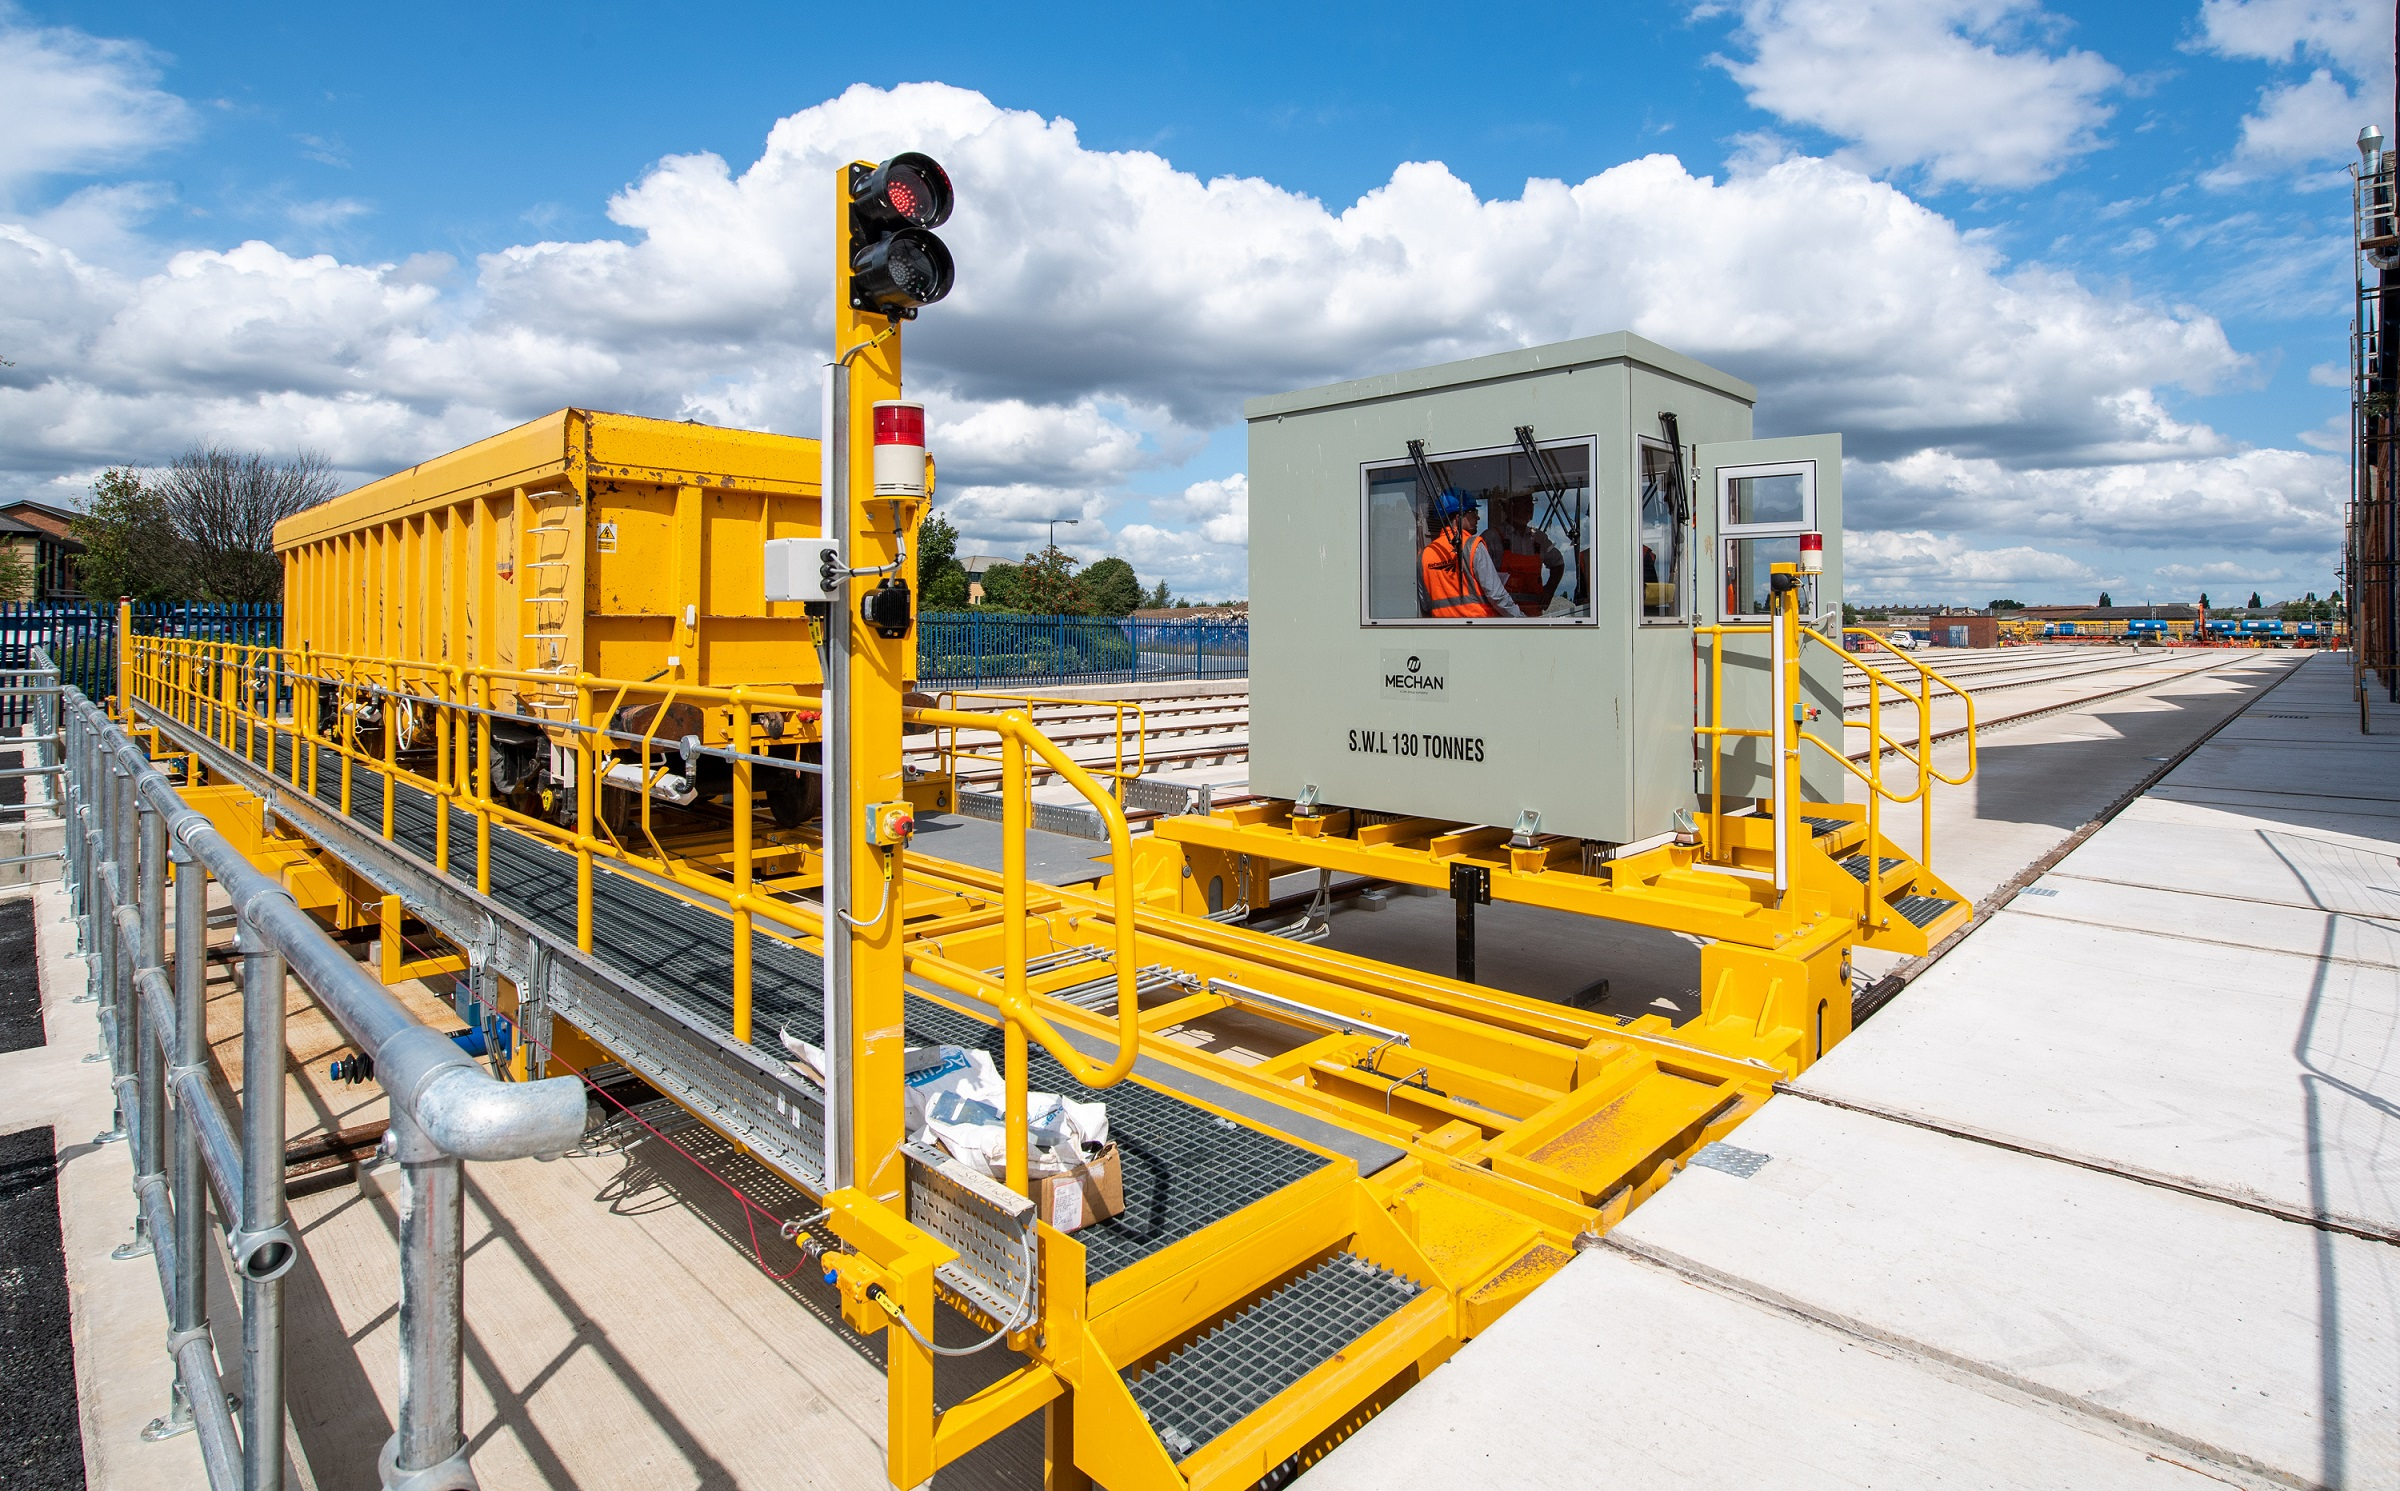 traverser and lifting jacks a network rail facility